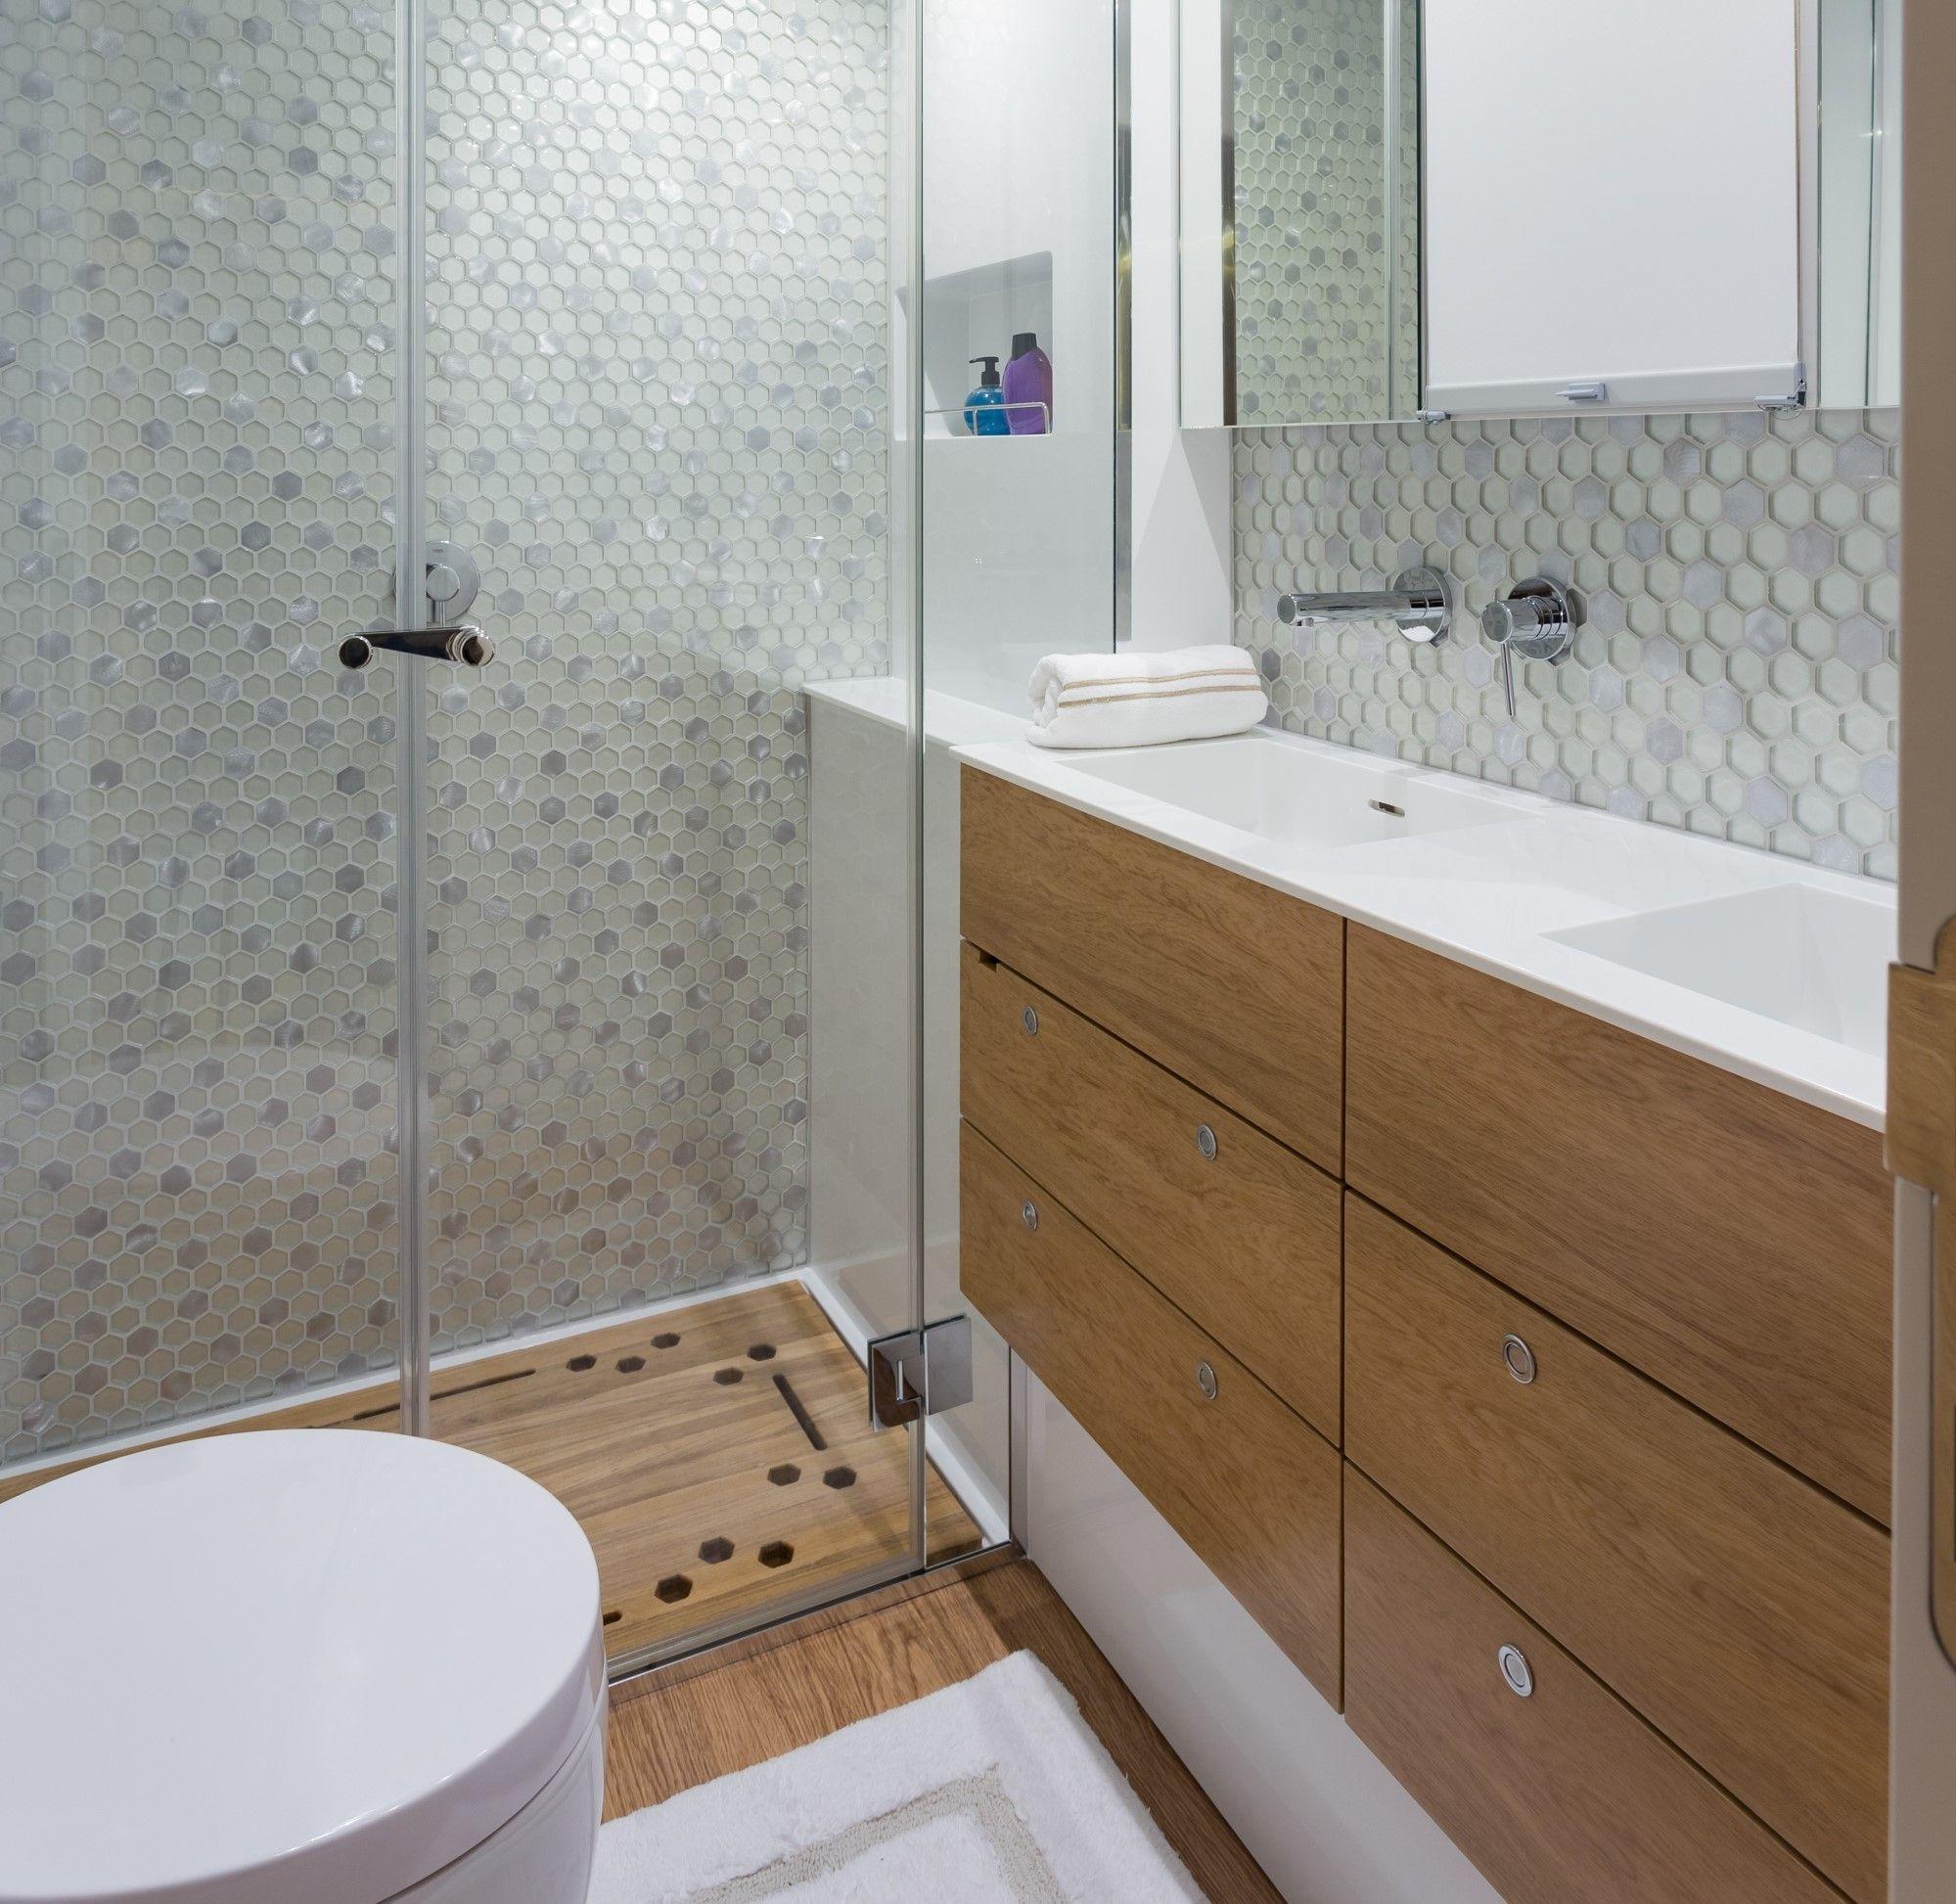 DIANA Sunreef 74 Luxury Catamaran Bathroom